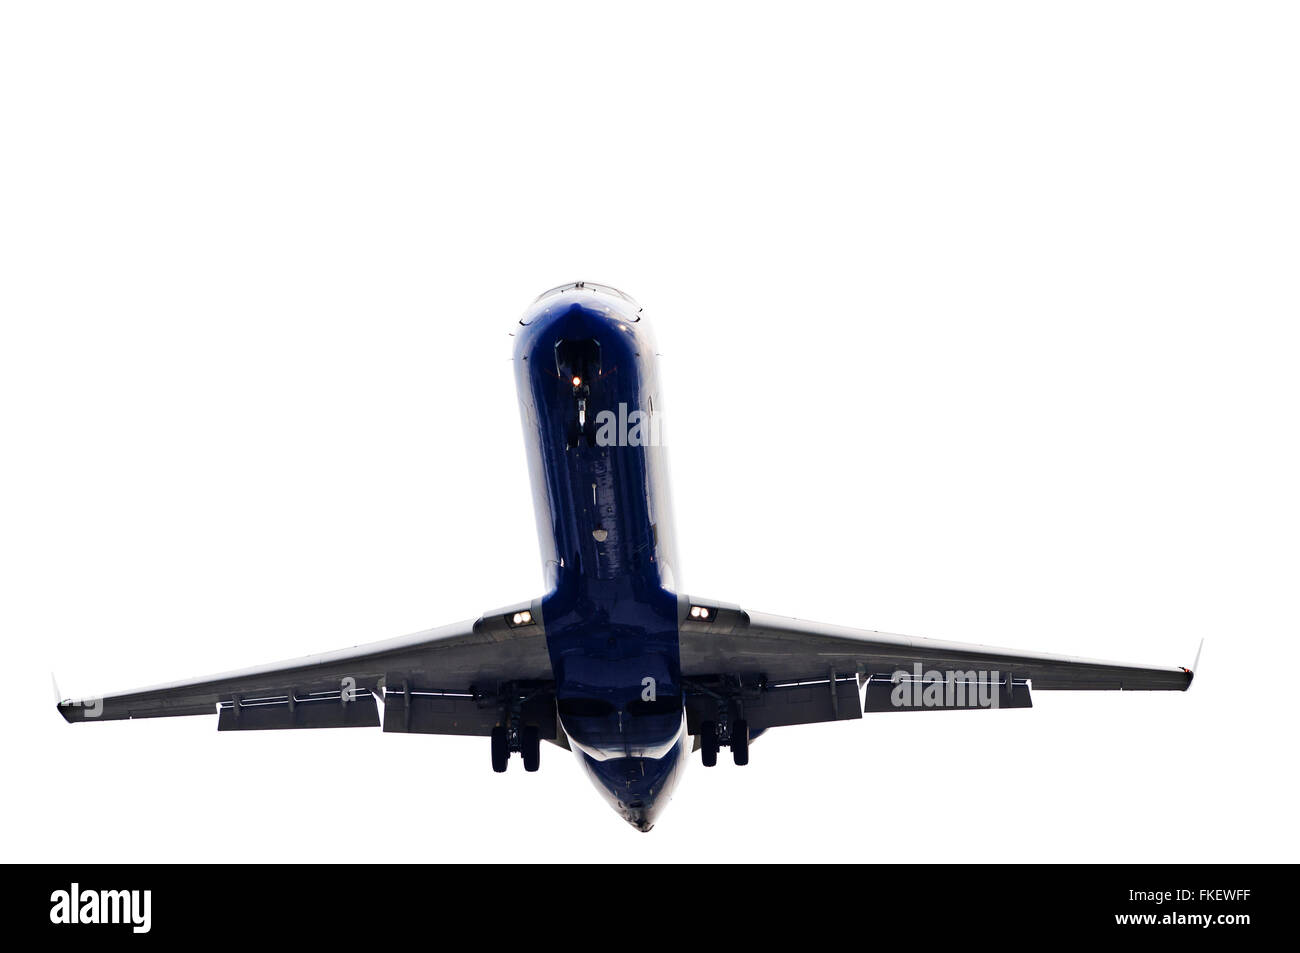 Jet Airliner Descending To Land - Stock Image